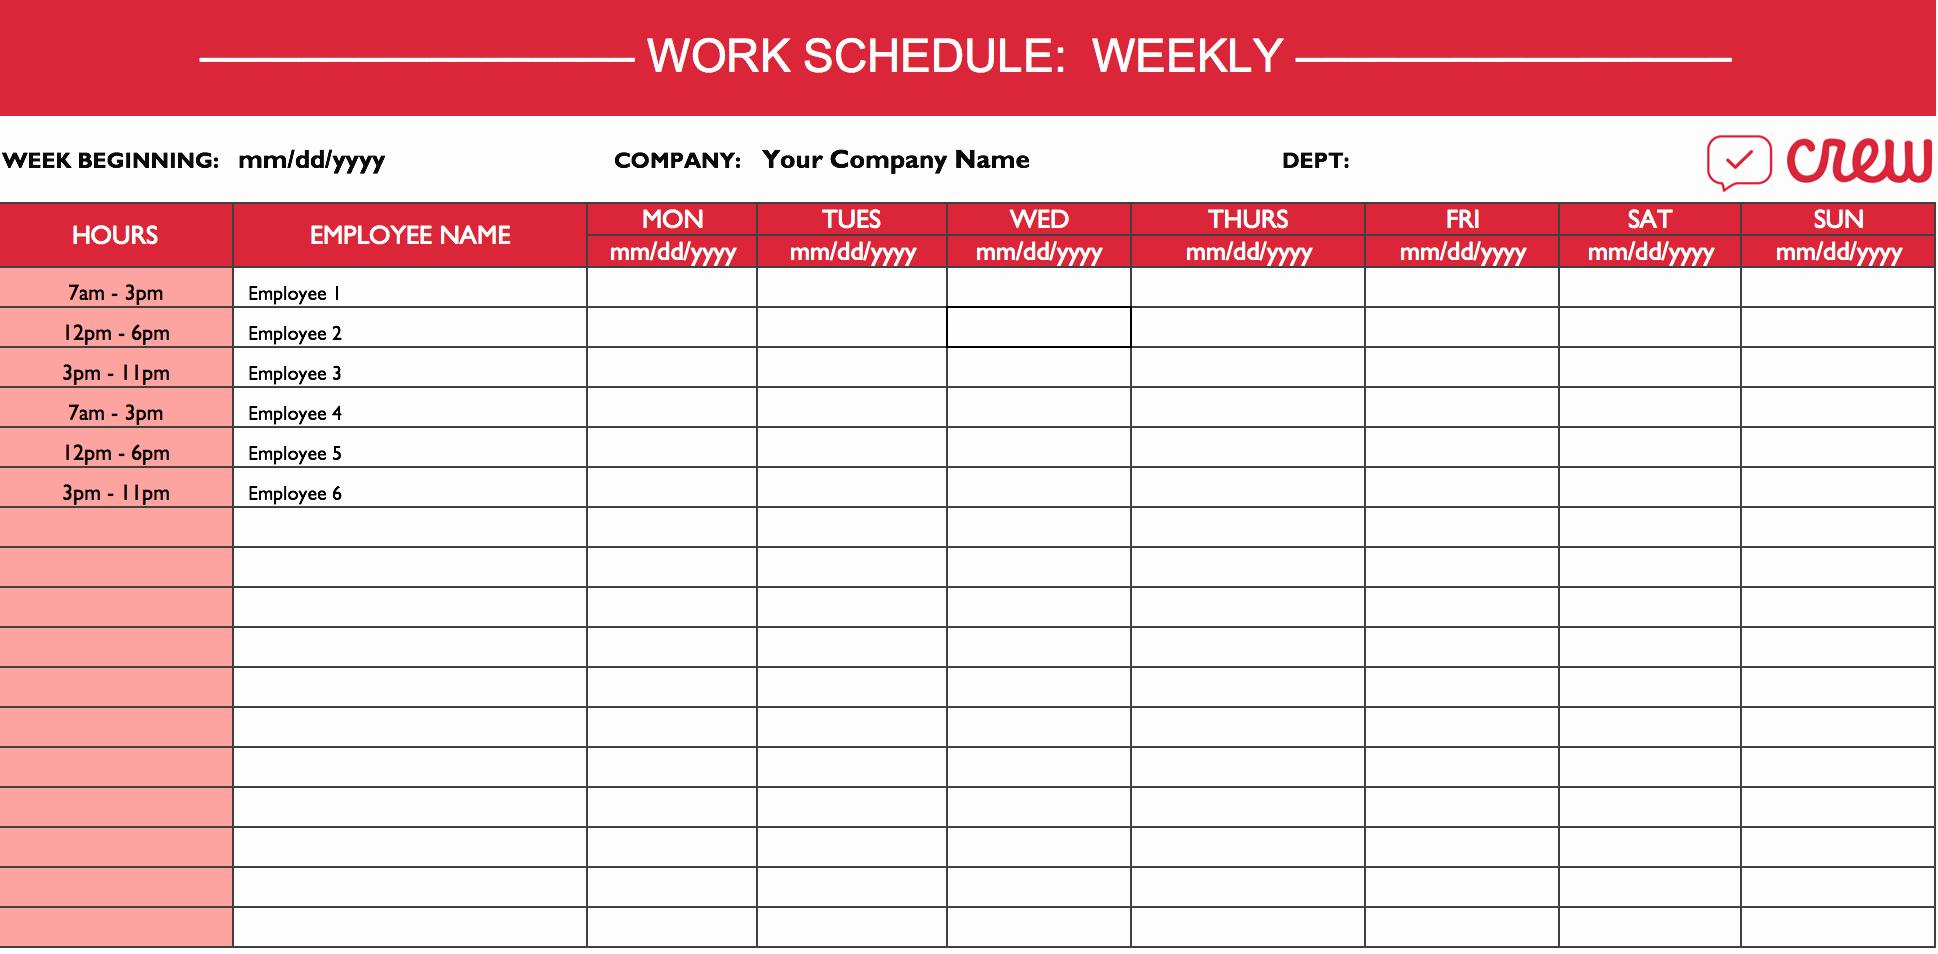 Free Employee Work Schedule Template Luxury Weekly Work Schedule Template I Crew